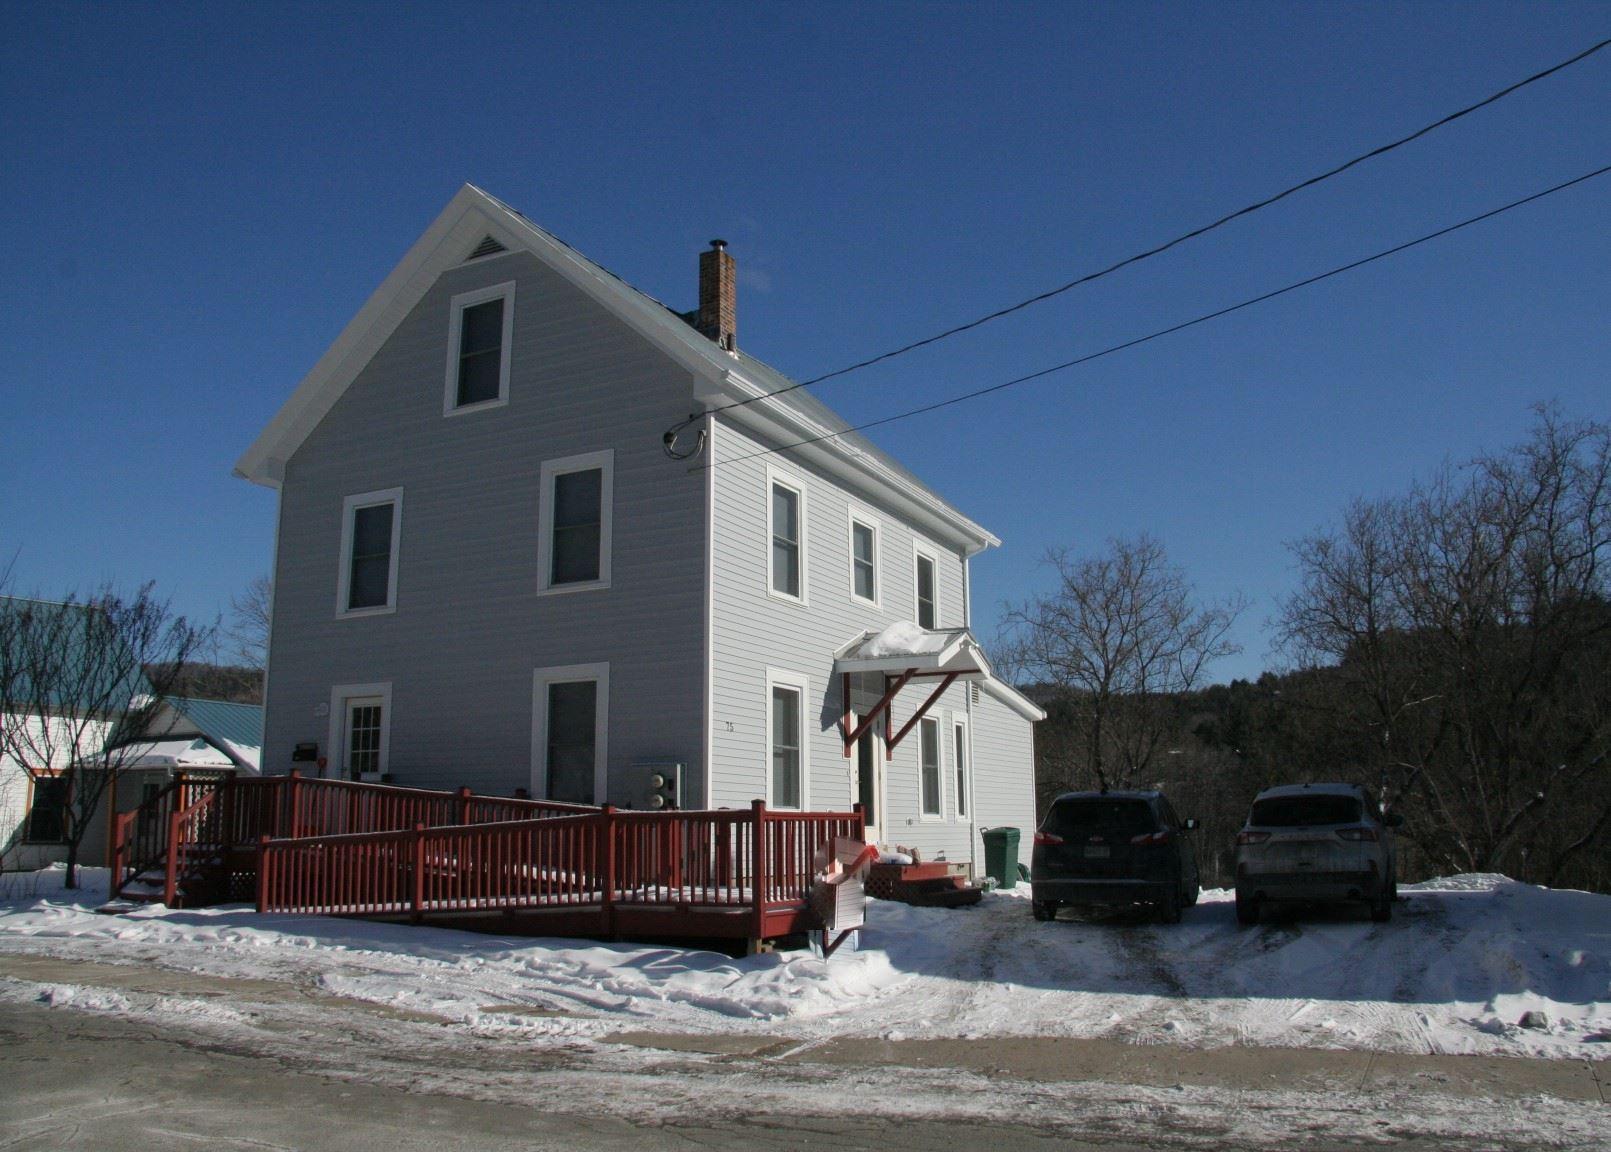 75 School Street, Saint Johnsbury, VT 05819 - MLS#: 4836955